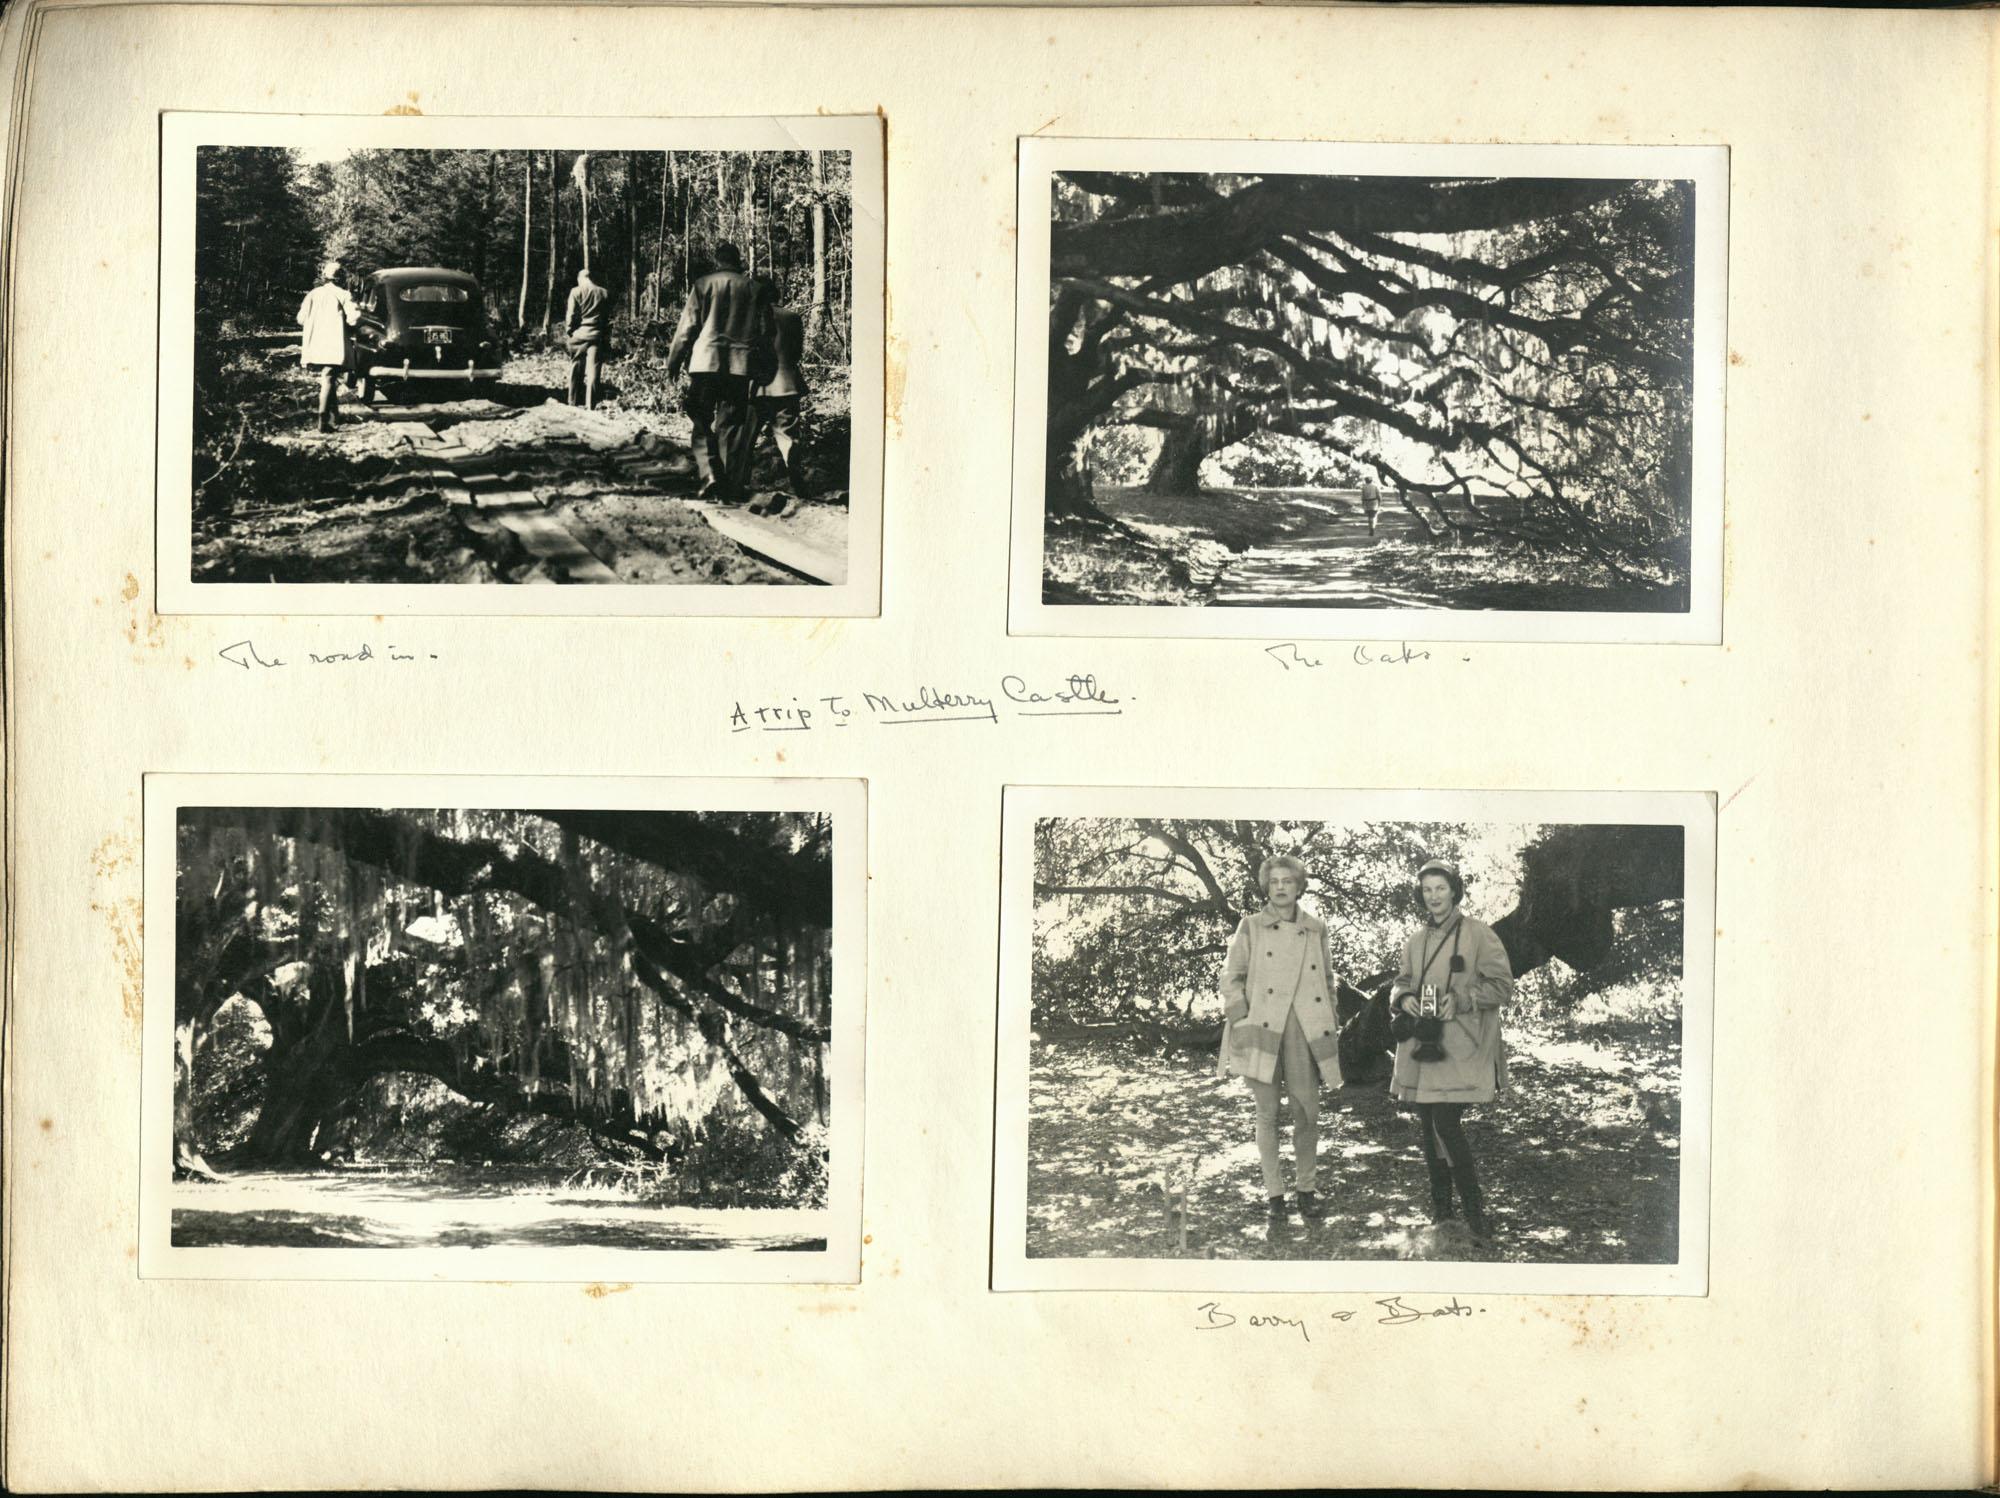 Medway Plantation Photograph Album, 1949, page 110